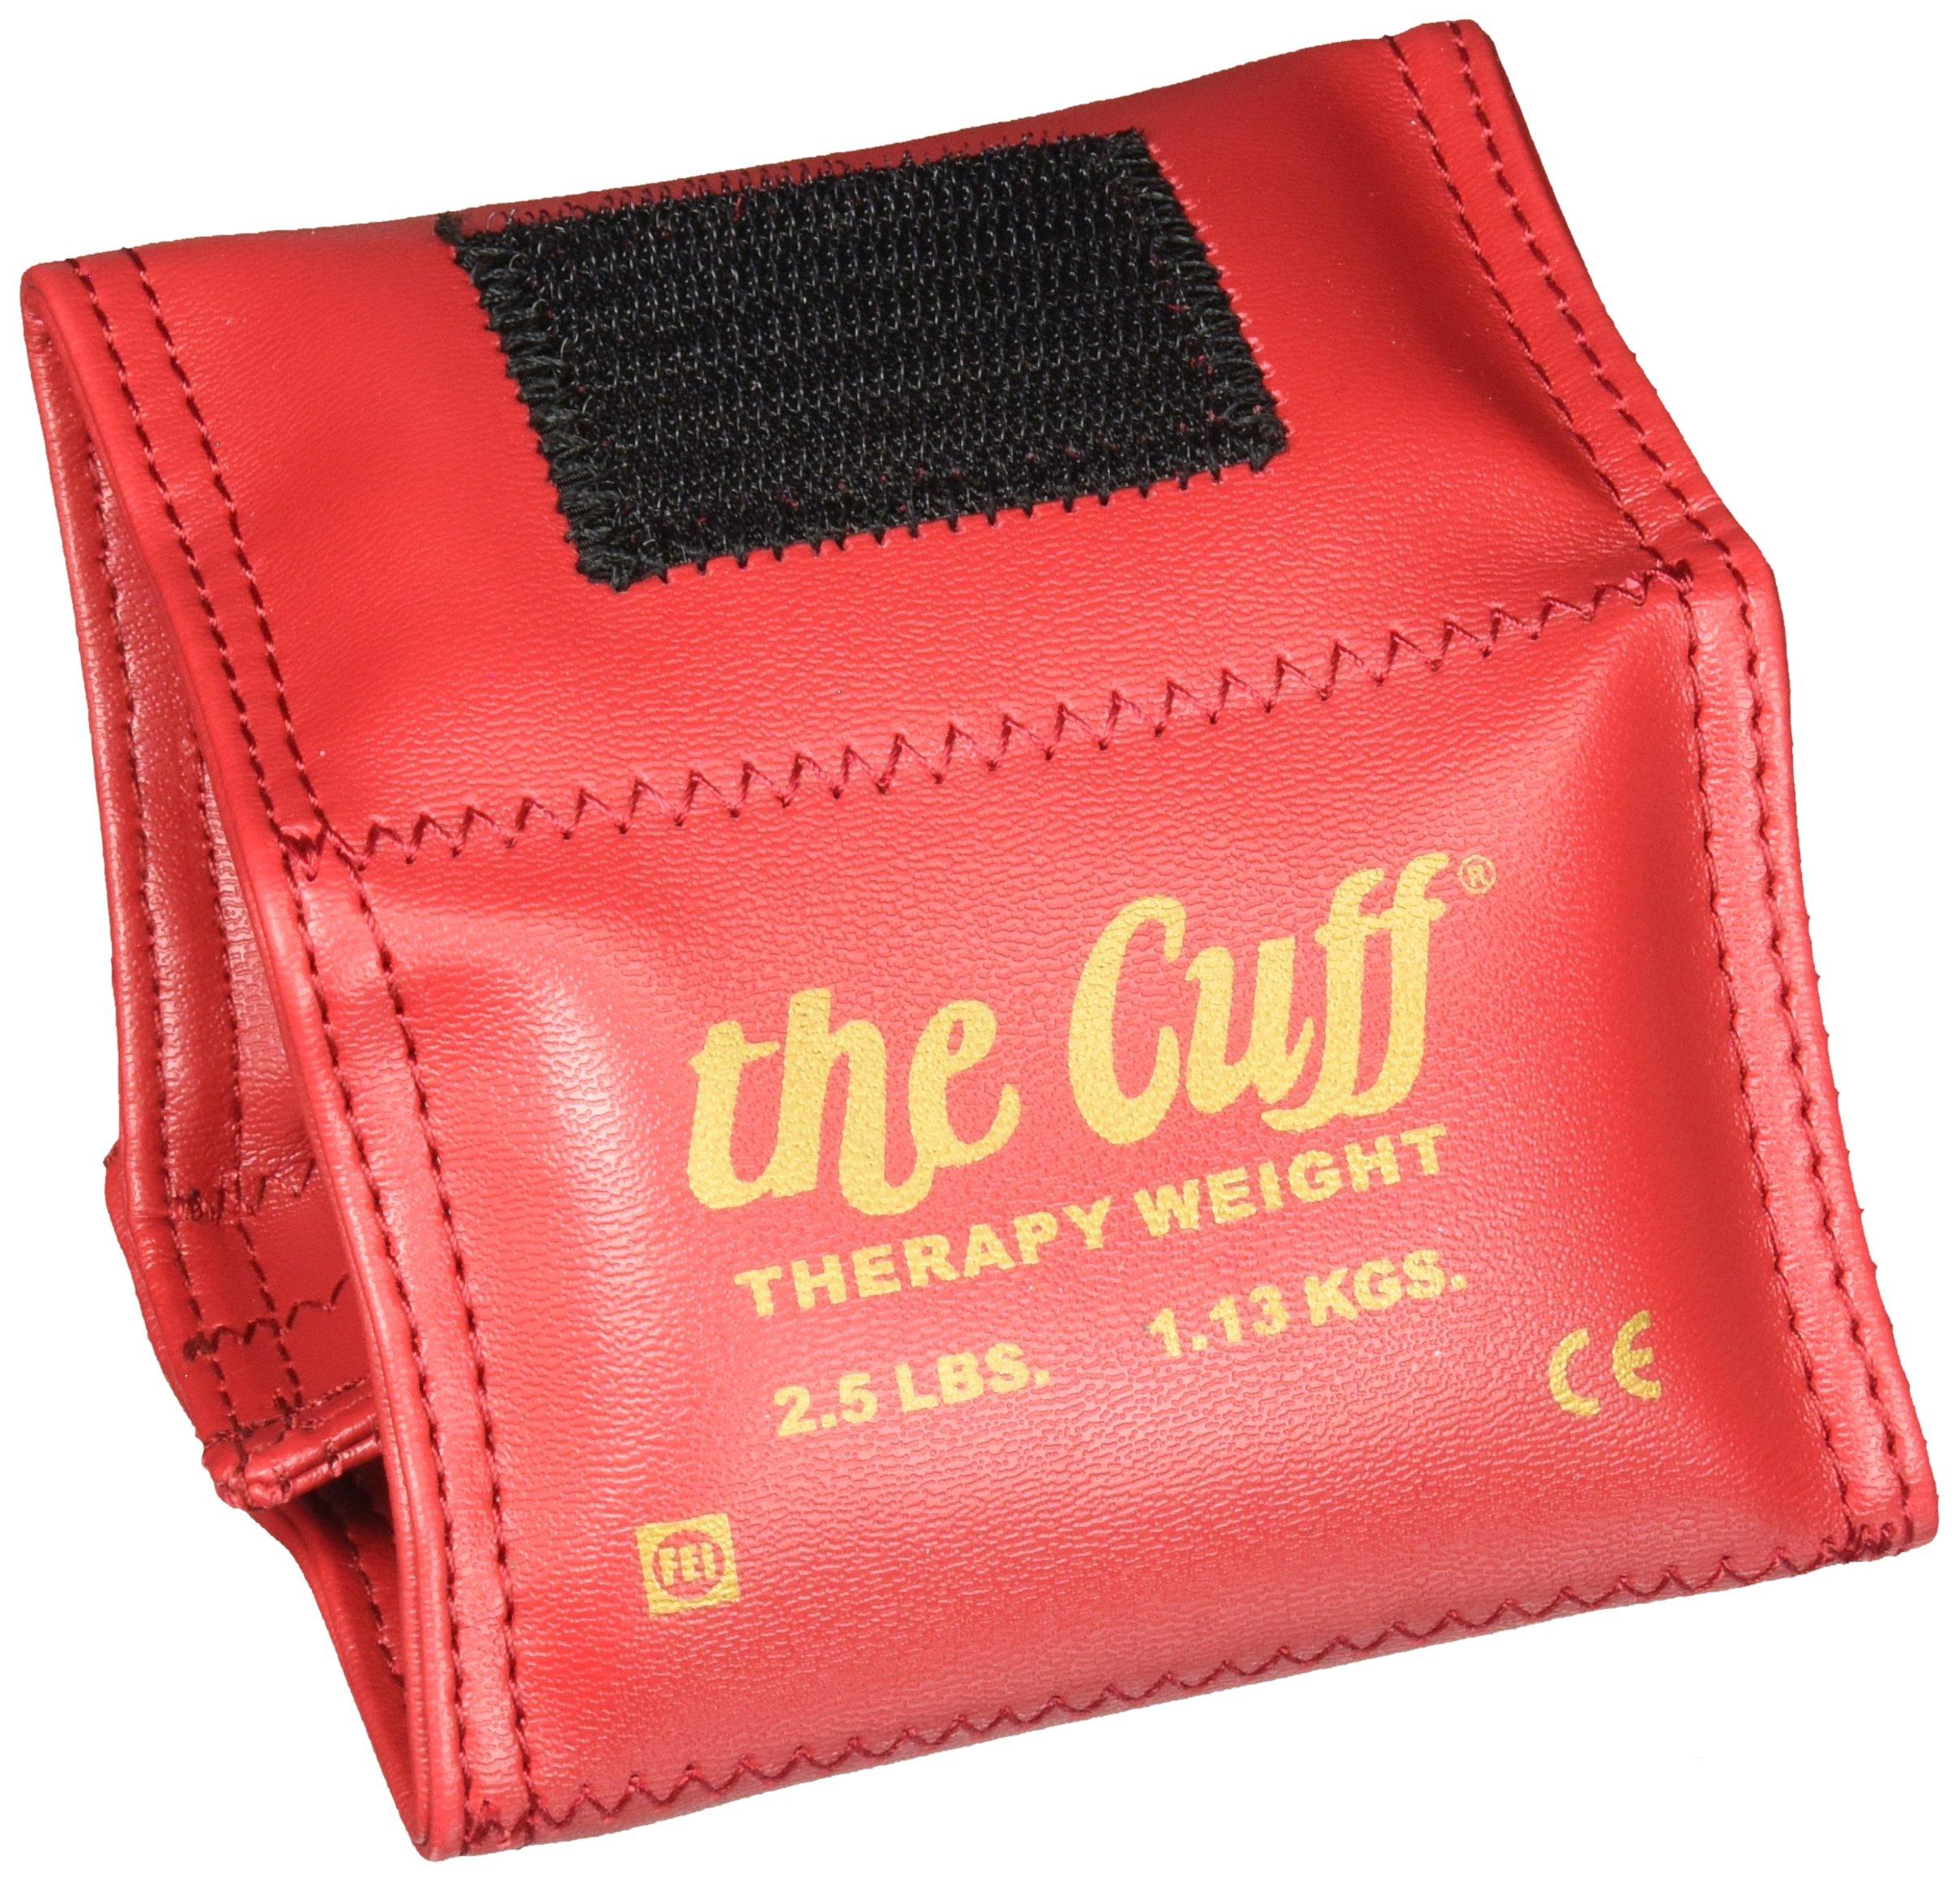 Mann Balego Cuff Weight, Red, 2.5 lbs.